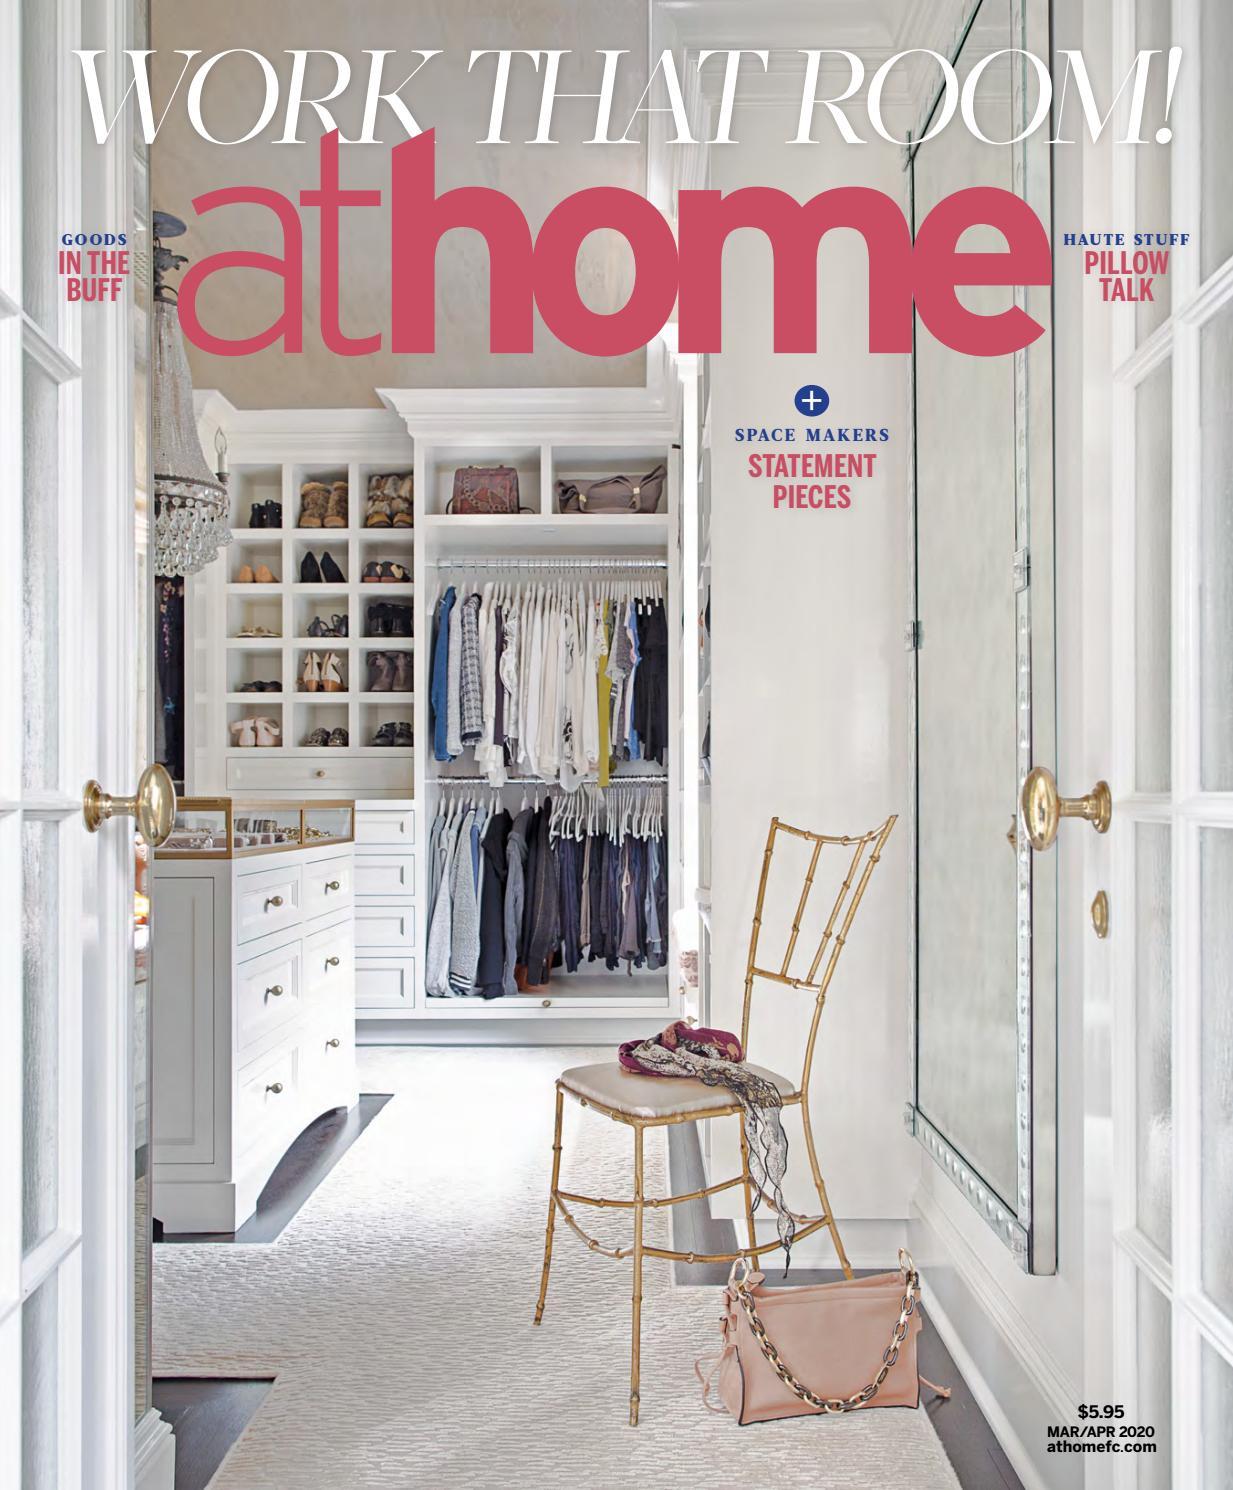 L Anfora Rattan Amphoren Lounge.Athome Magazine March April 2020 By Moffly Media Issuu